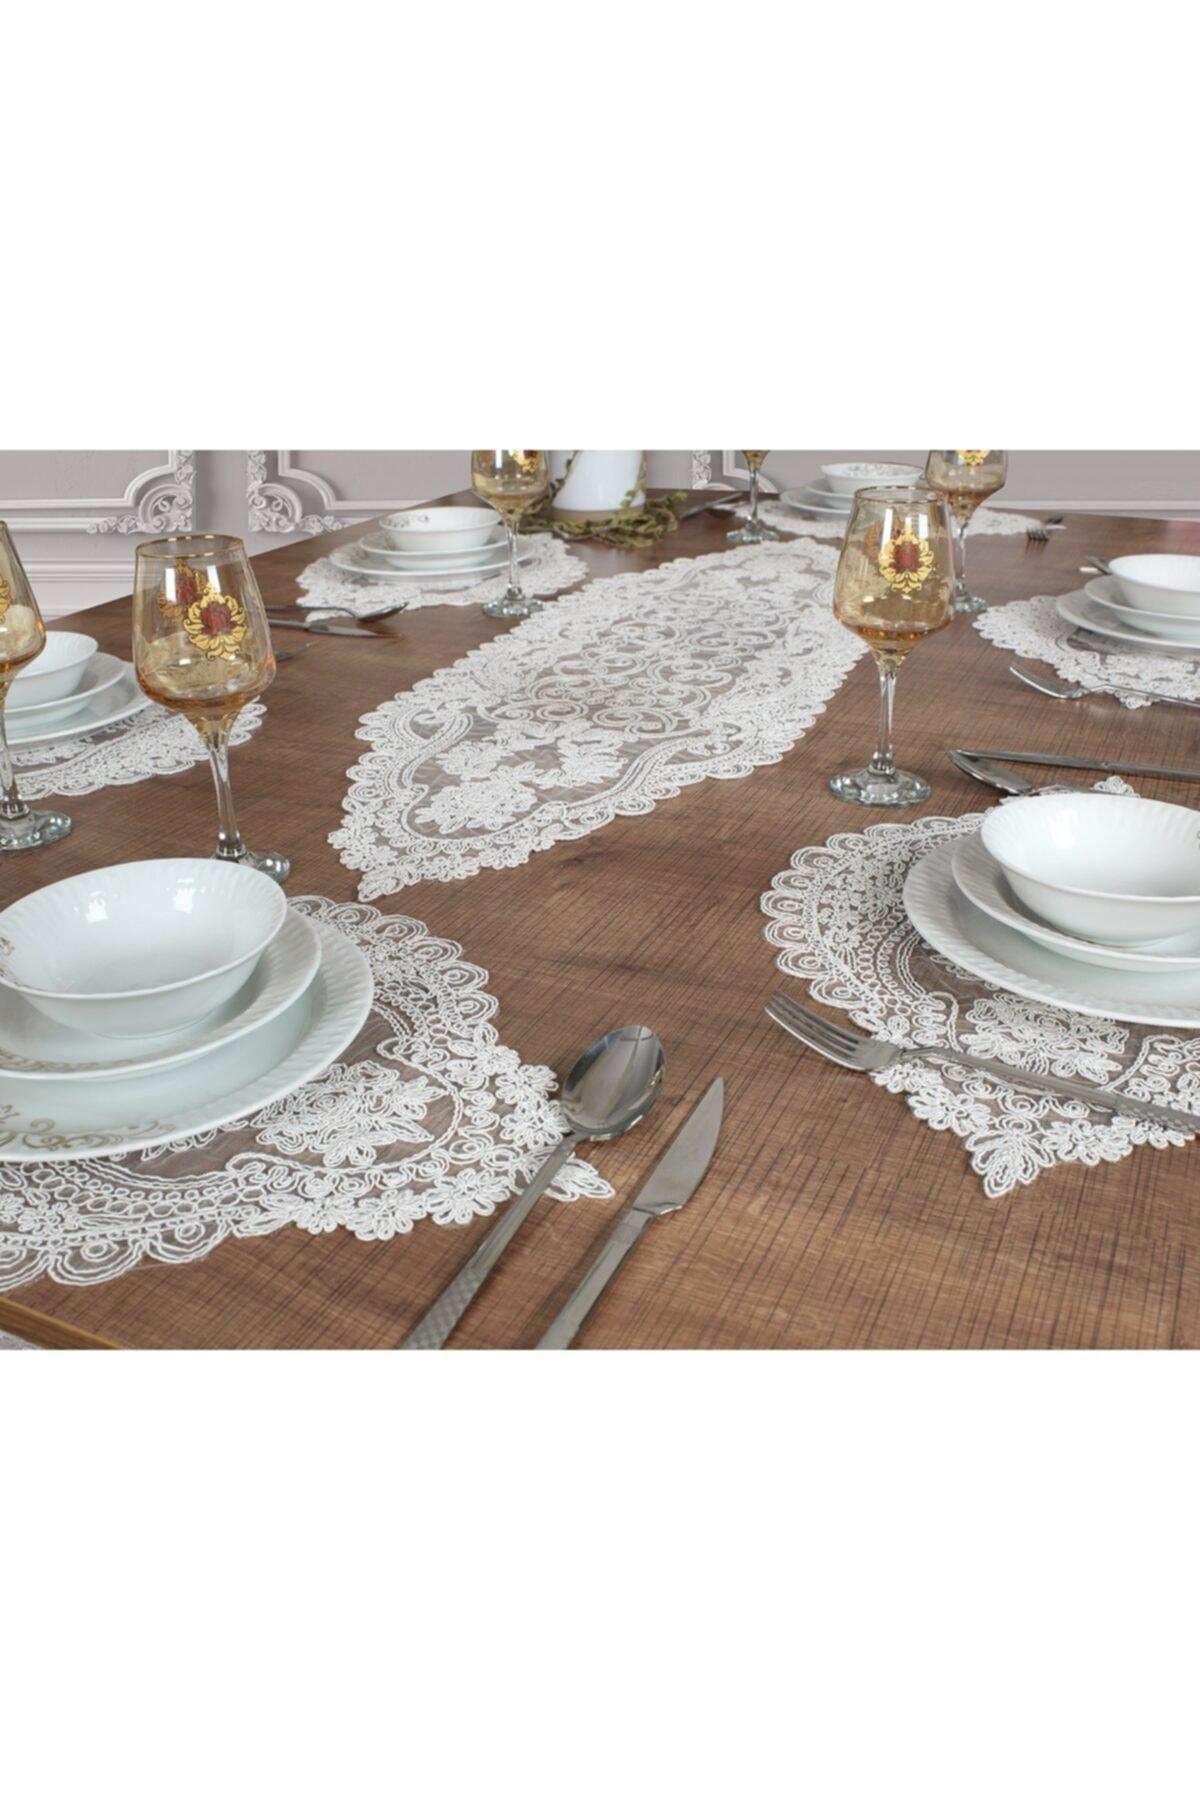 Supla-مفرش طاولة ، طقم من 6 ، 7 قطع ، أبيض فيفين ، حفلة خاصة ، دانتيل ، تصميم أنيق ، غرفة طعام